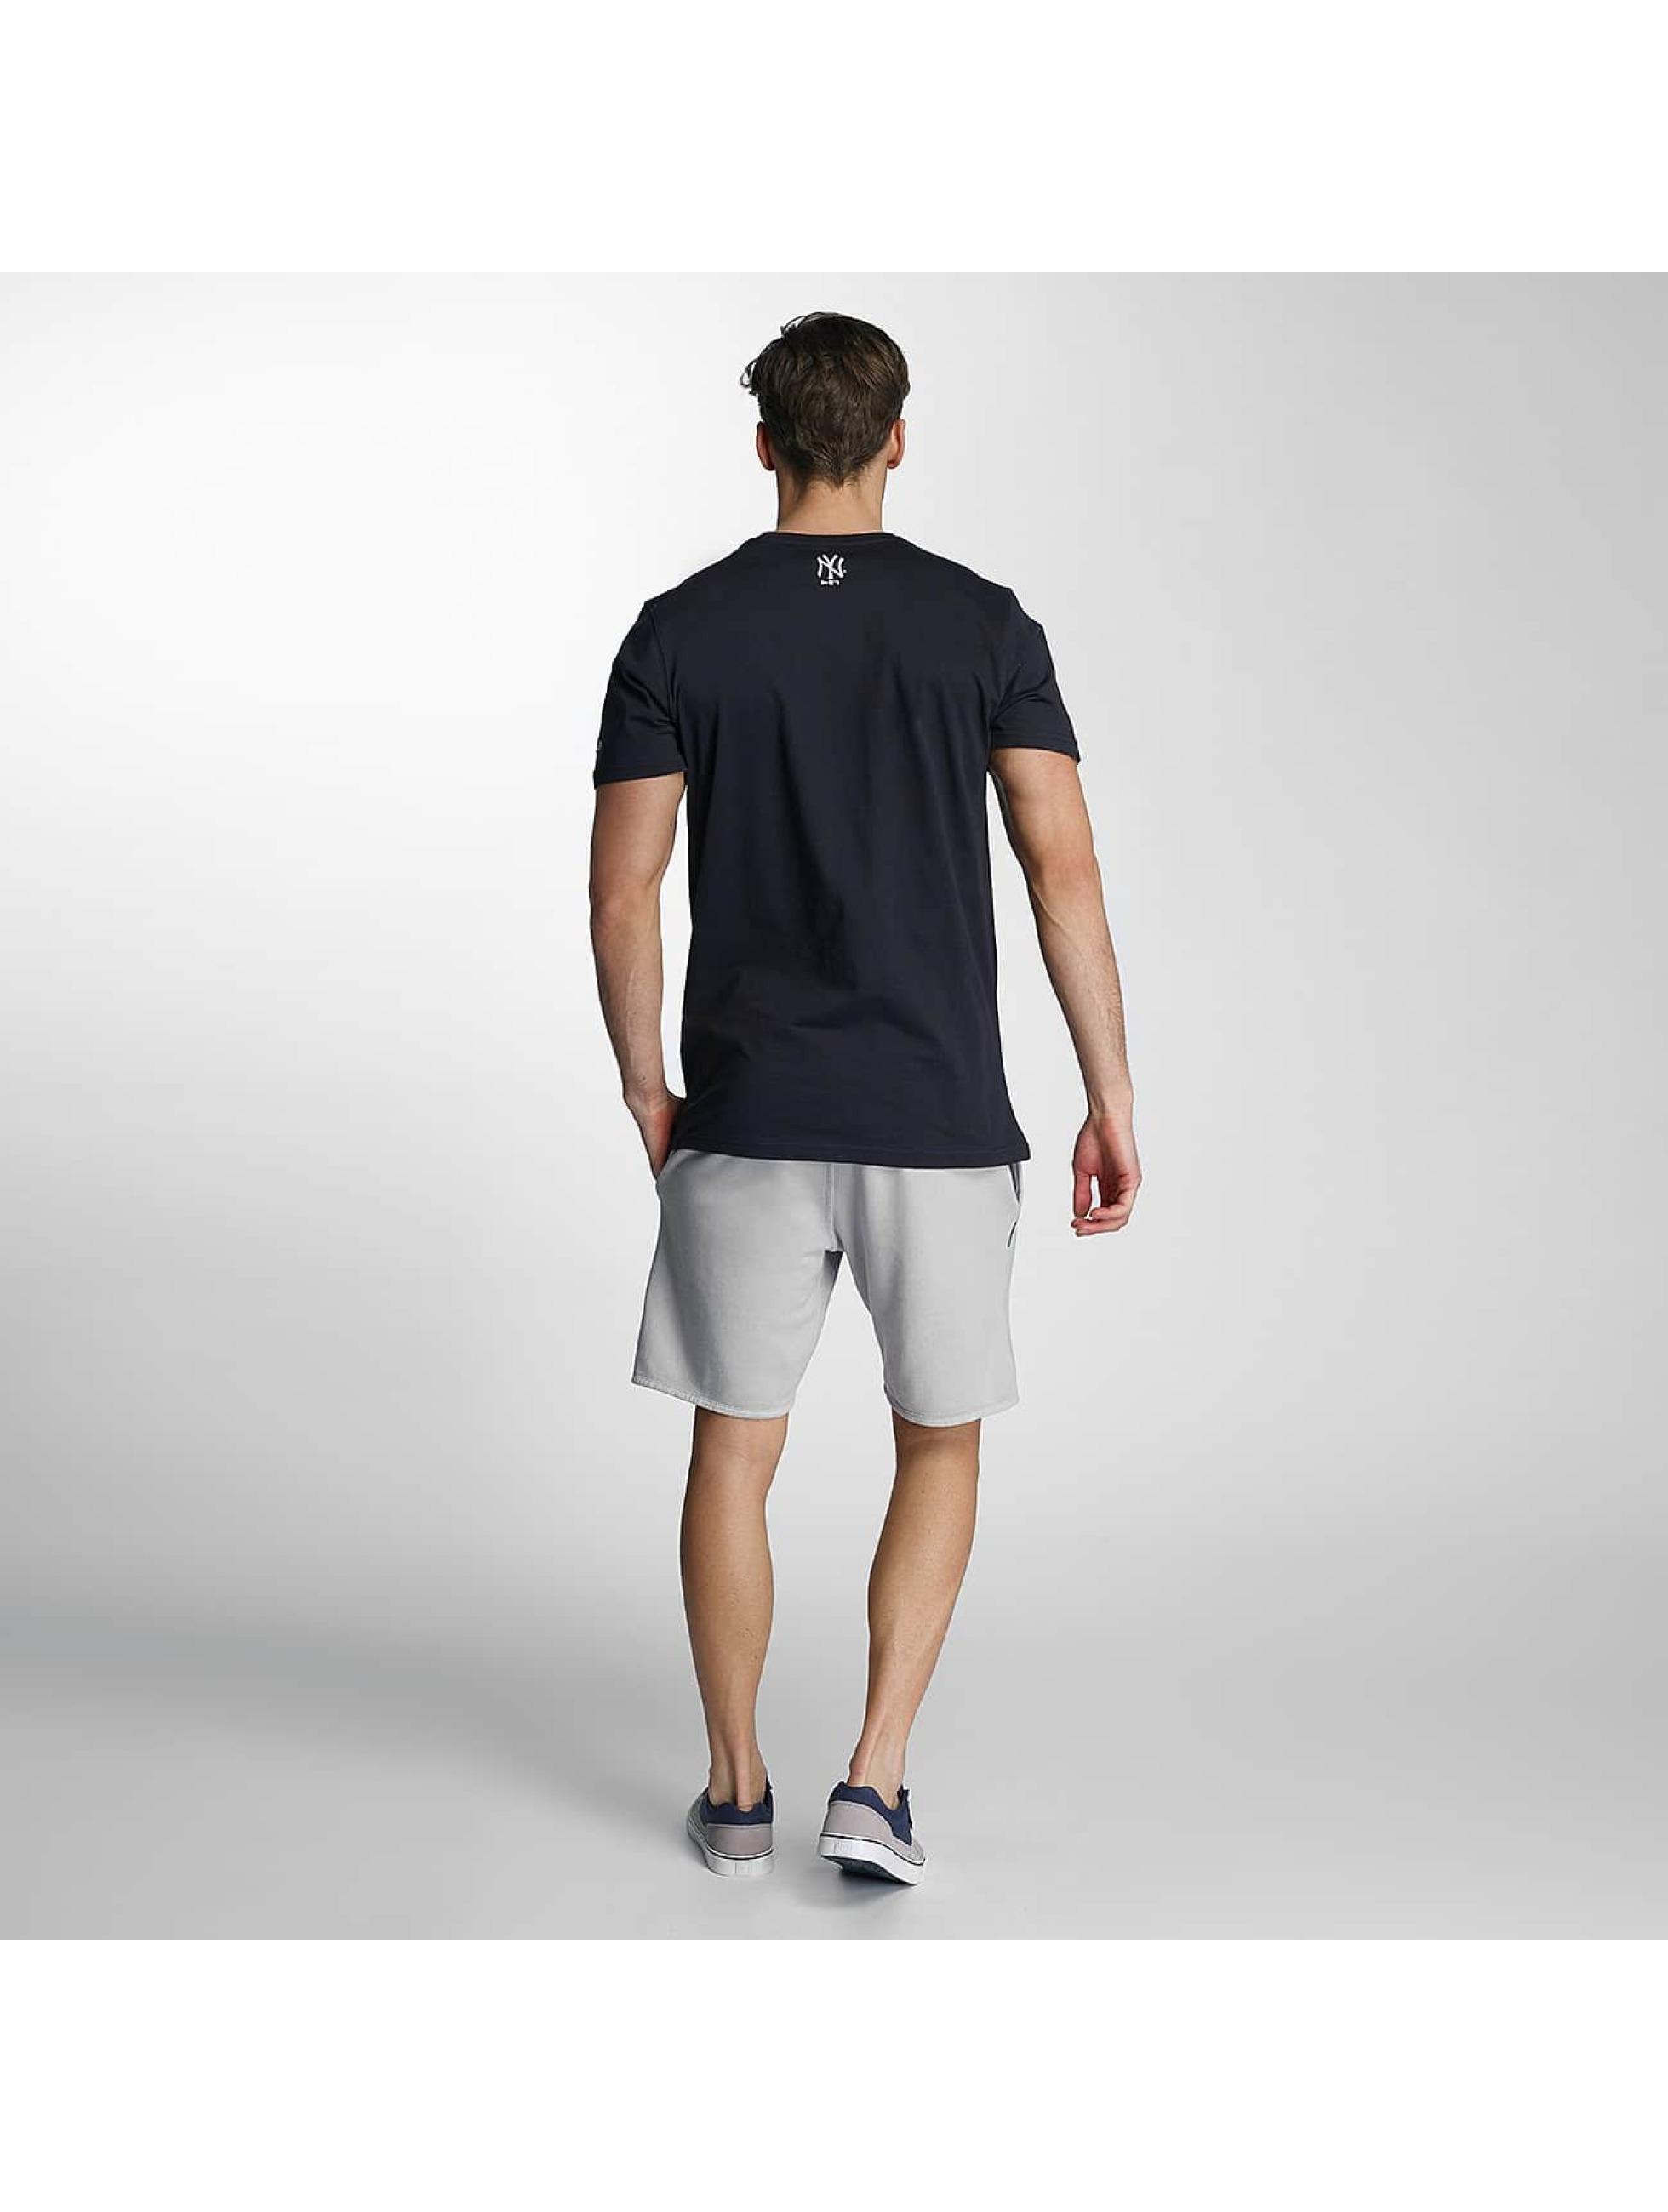 New Era Short Sandwash grey